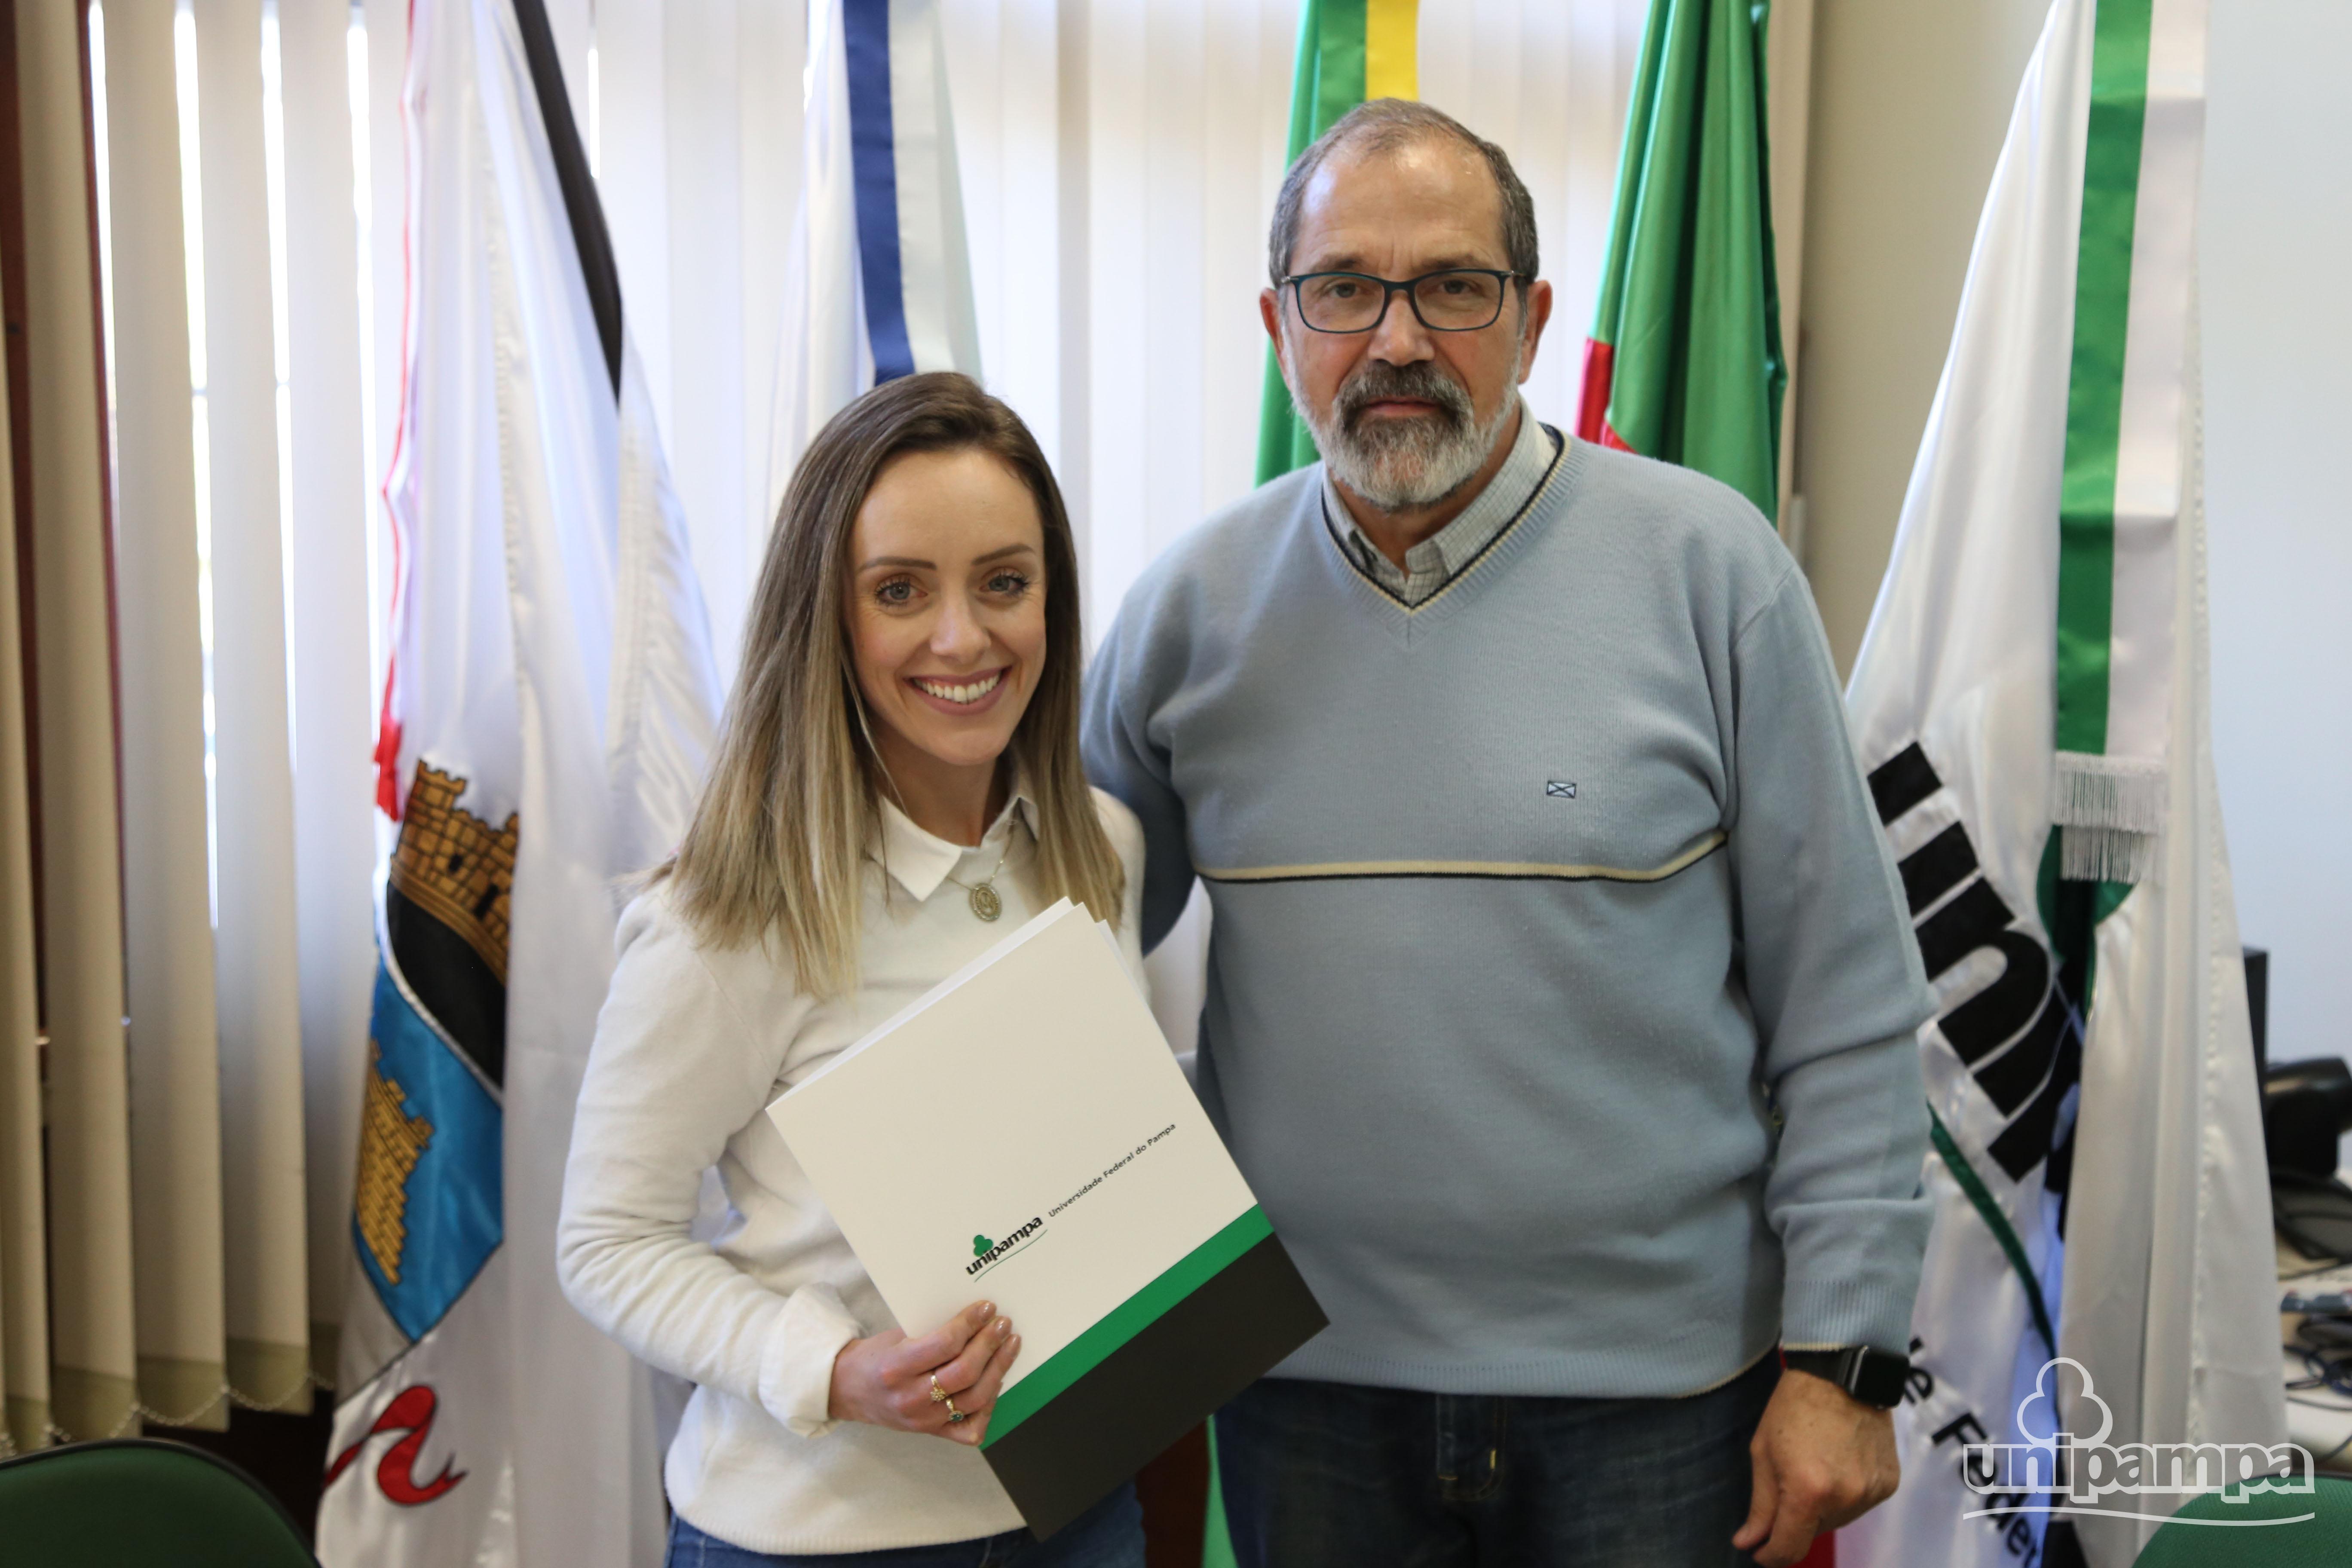 Unipampa recebe novos professores durante cerimônia oficial